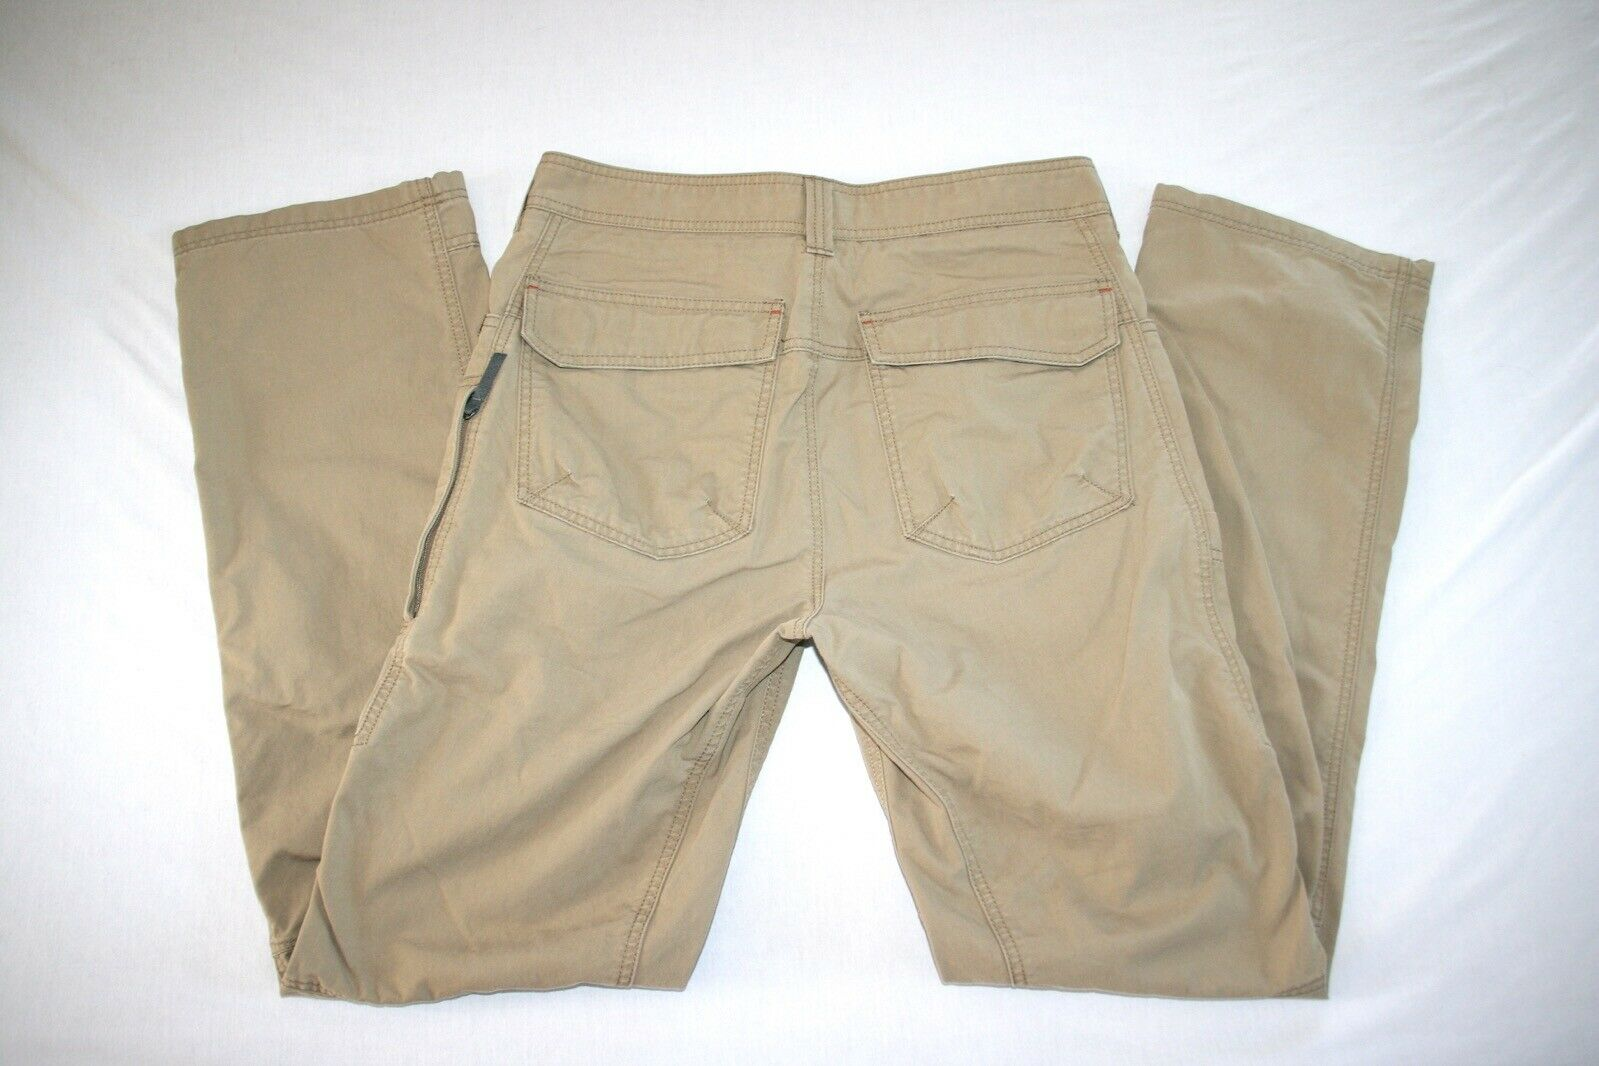 LL Bean Rigreenon Pants Men 32x34 Khaki NEW